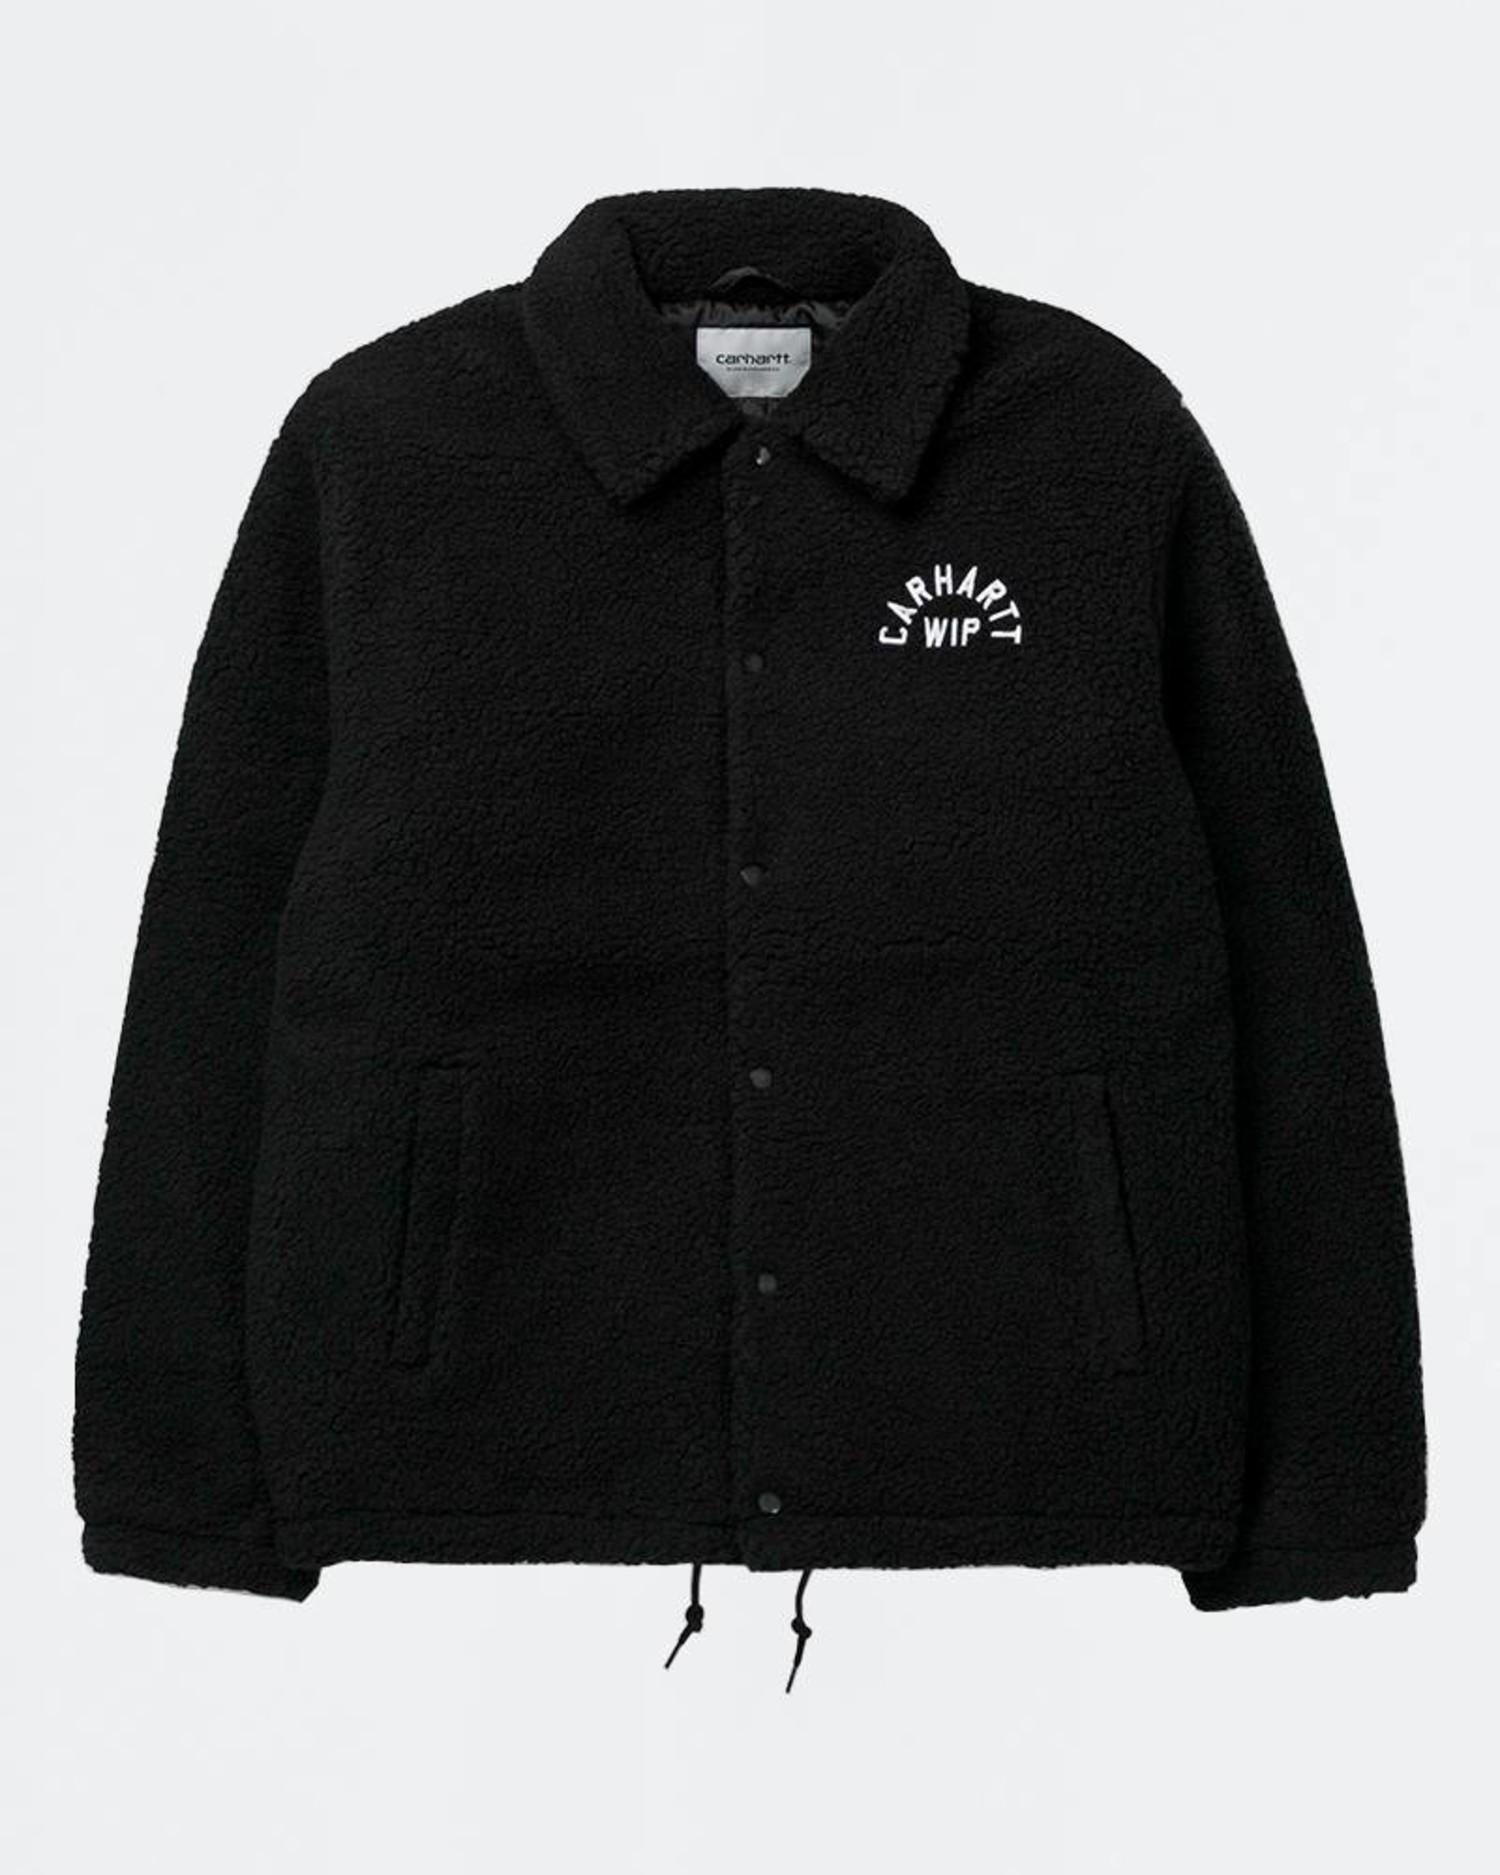 Carhartt Arch Coach jacket Black